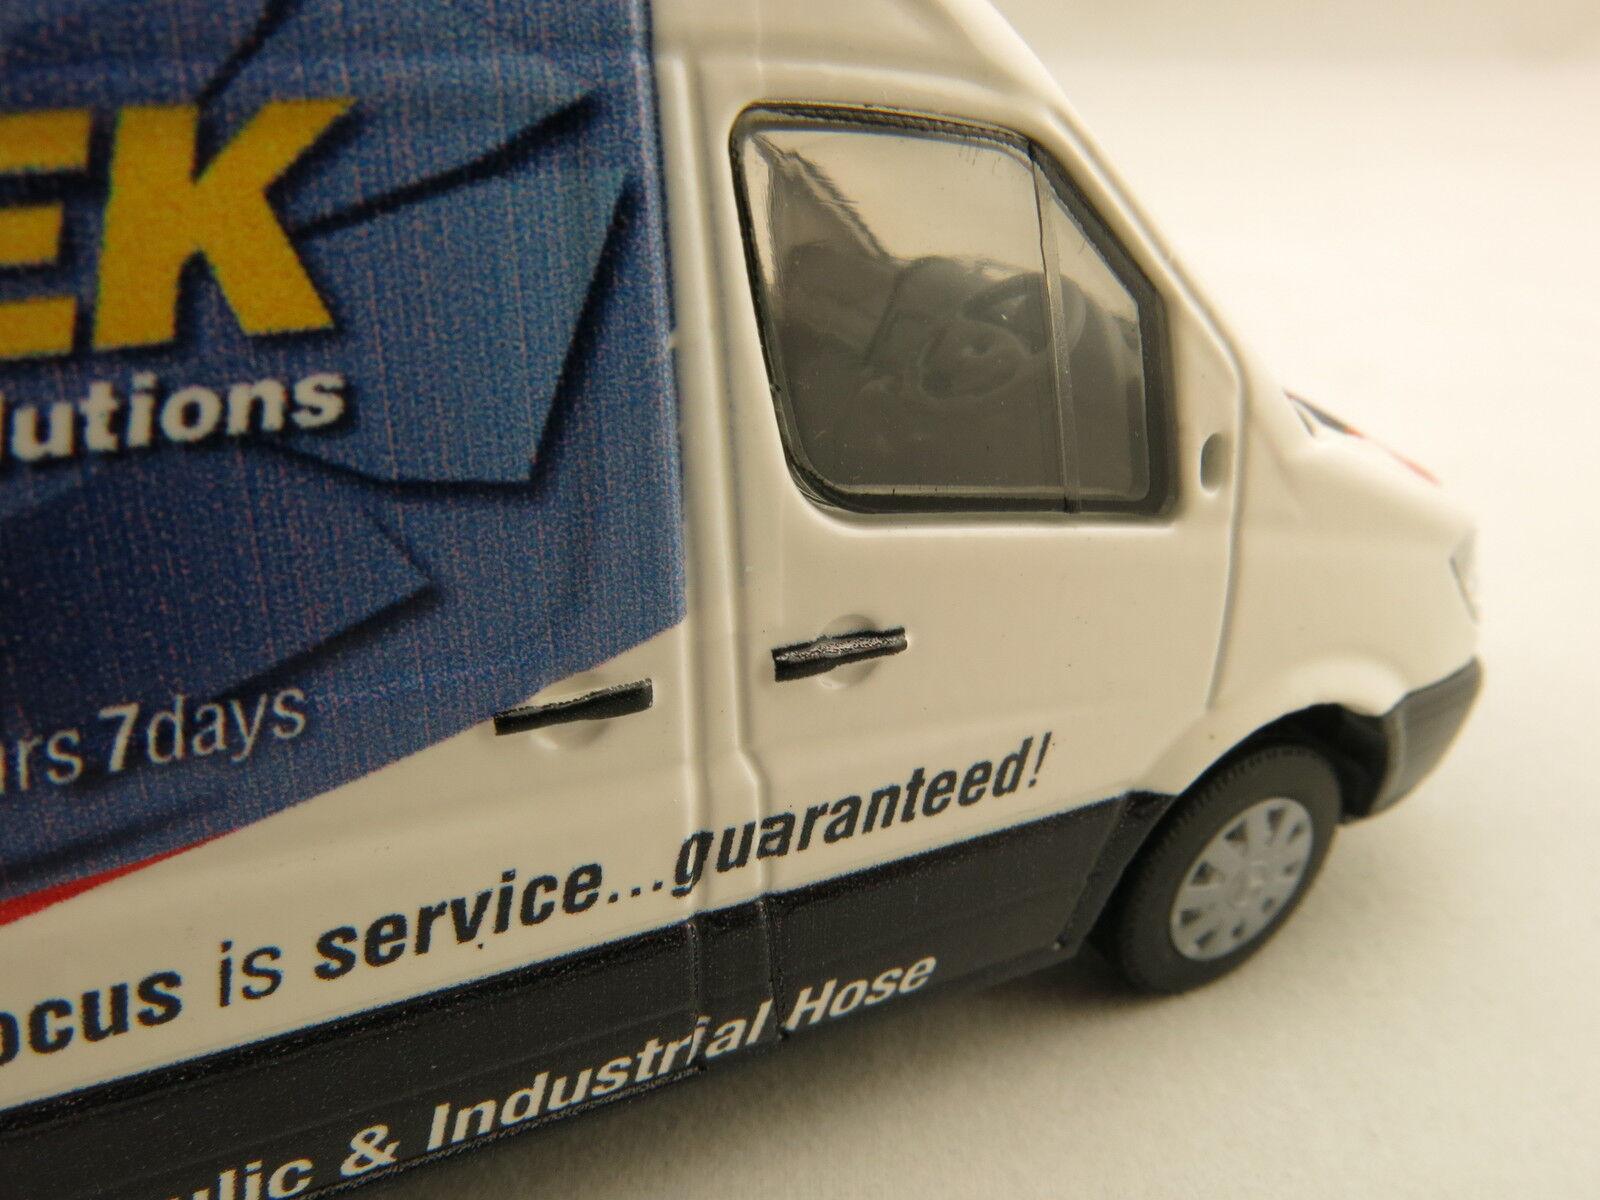 Conrad Australian Mercedes Benz Sprinter Service Van Pirtek Fluids 1610-11 1610-11 1610-11 1 50 c8450f